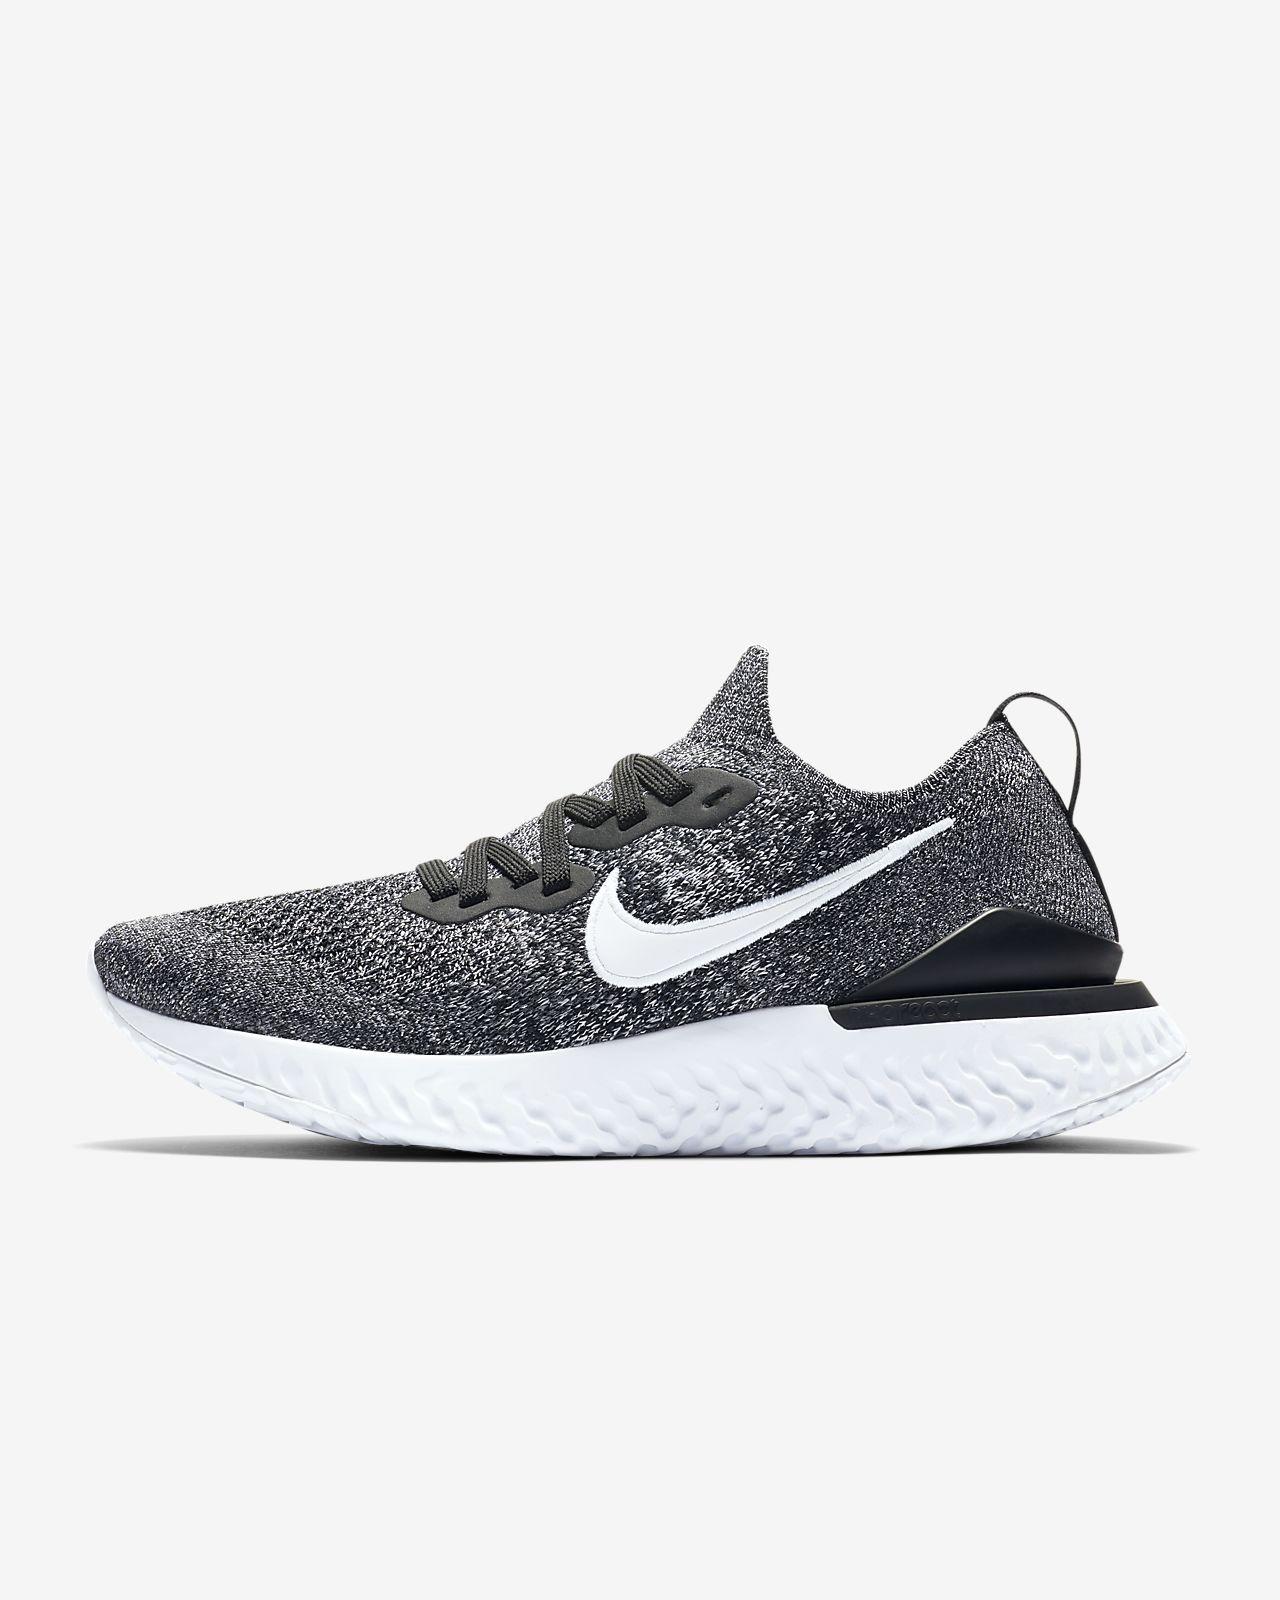 hot sale sale usa online online retailer Chaussure de running Nike Epic React Flyknit 2 pour Femme